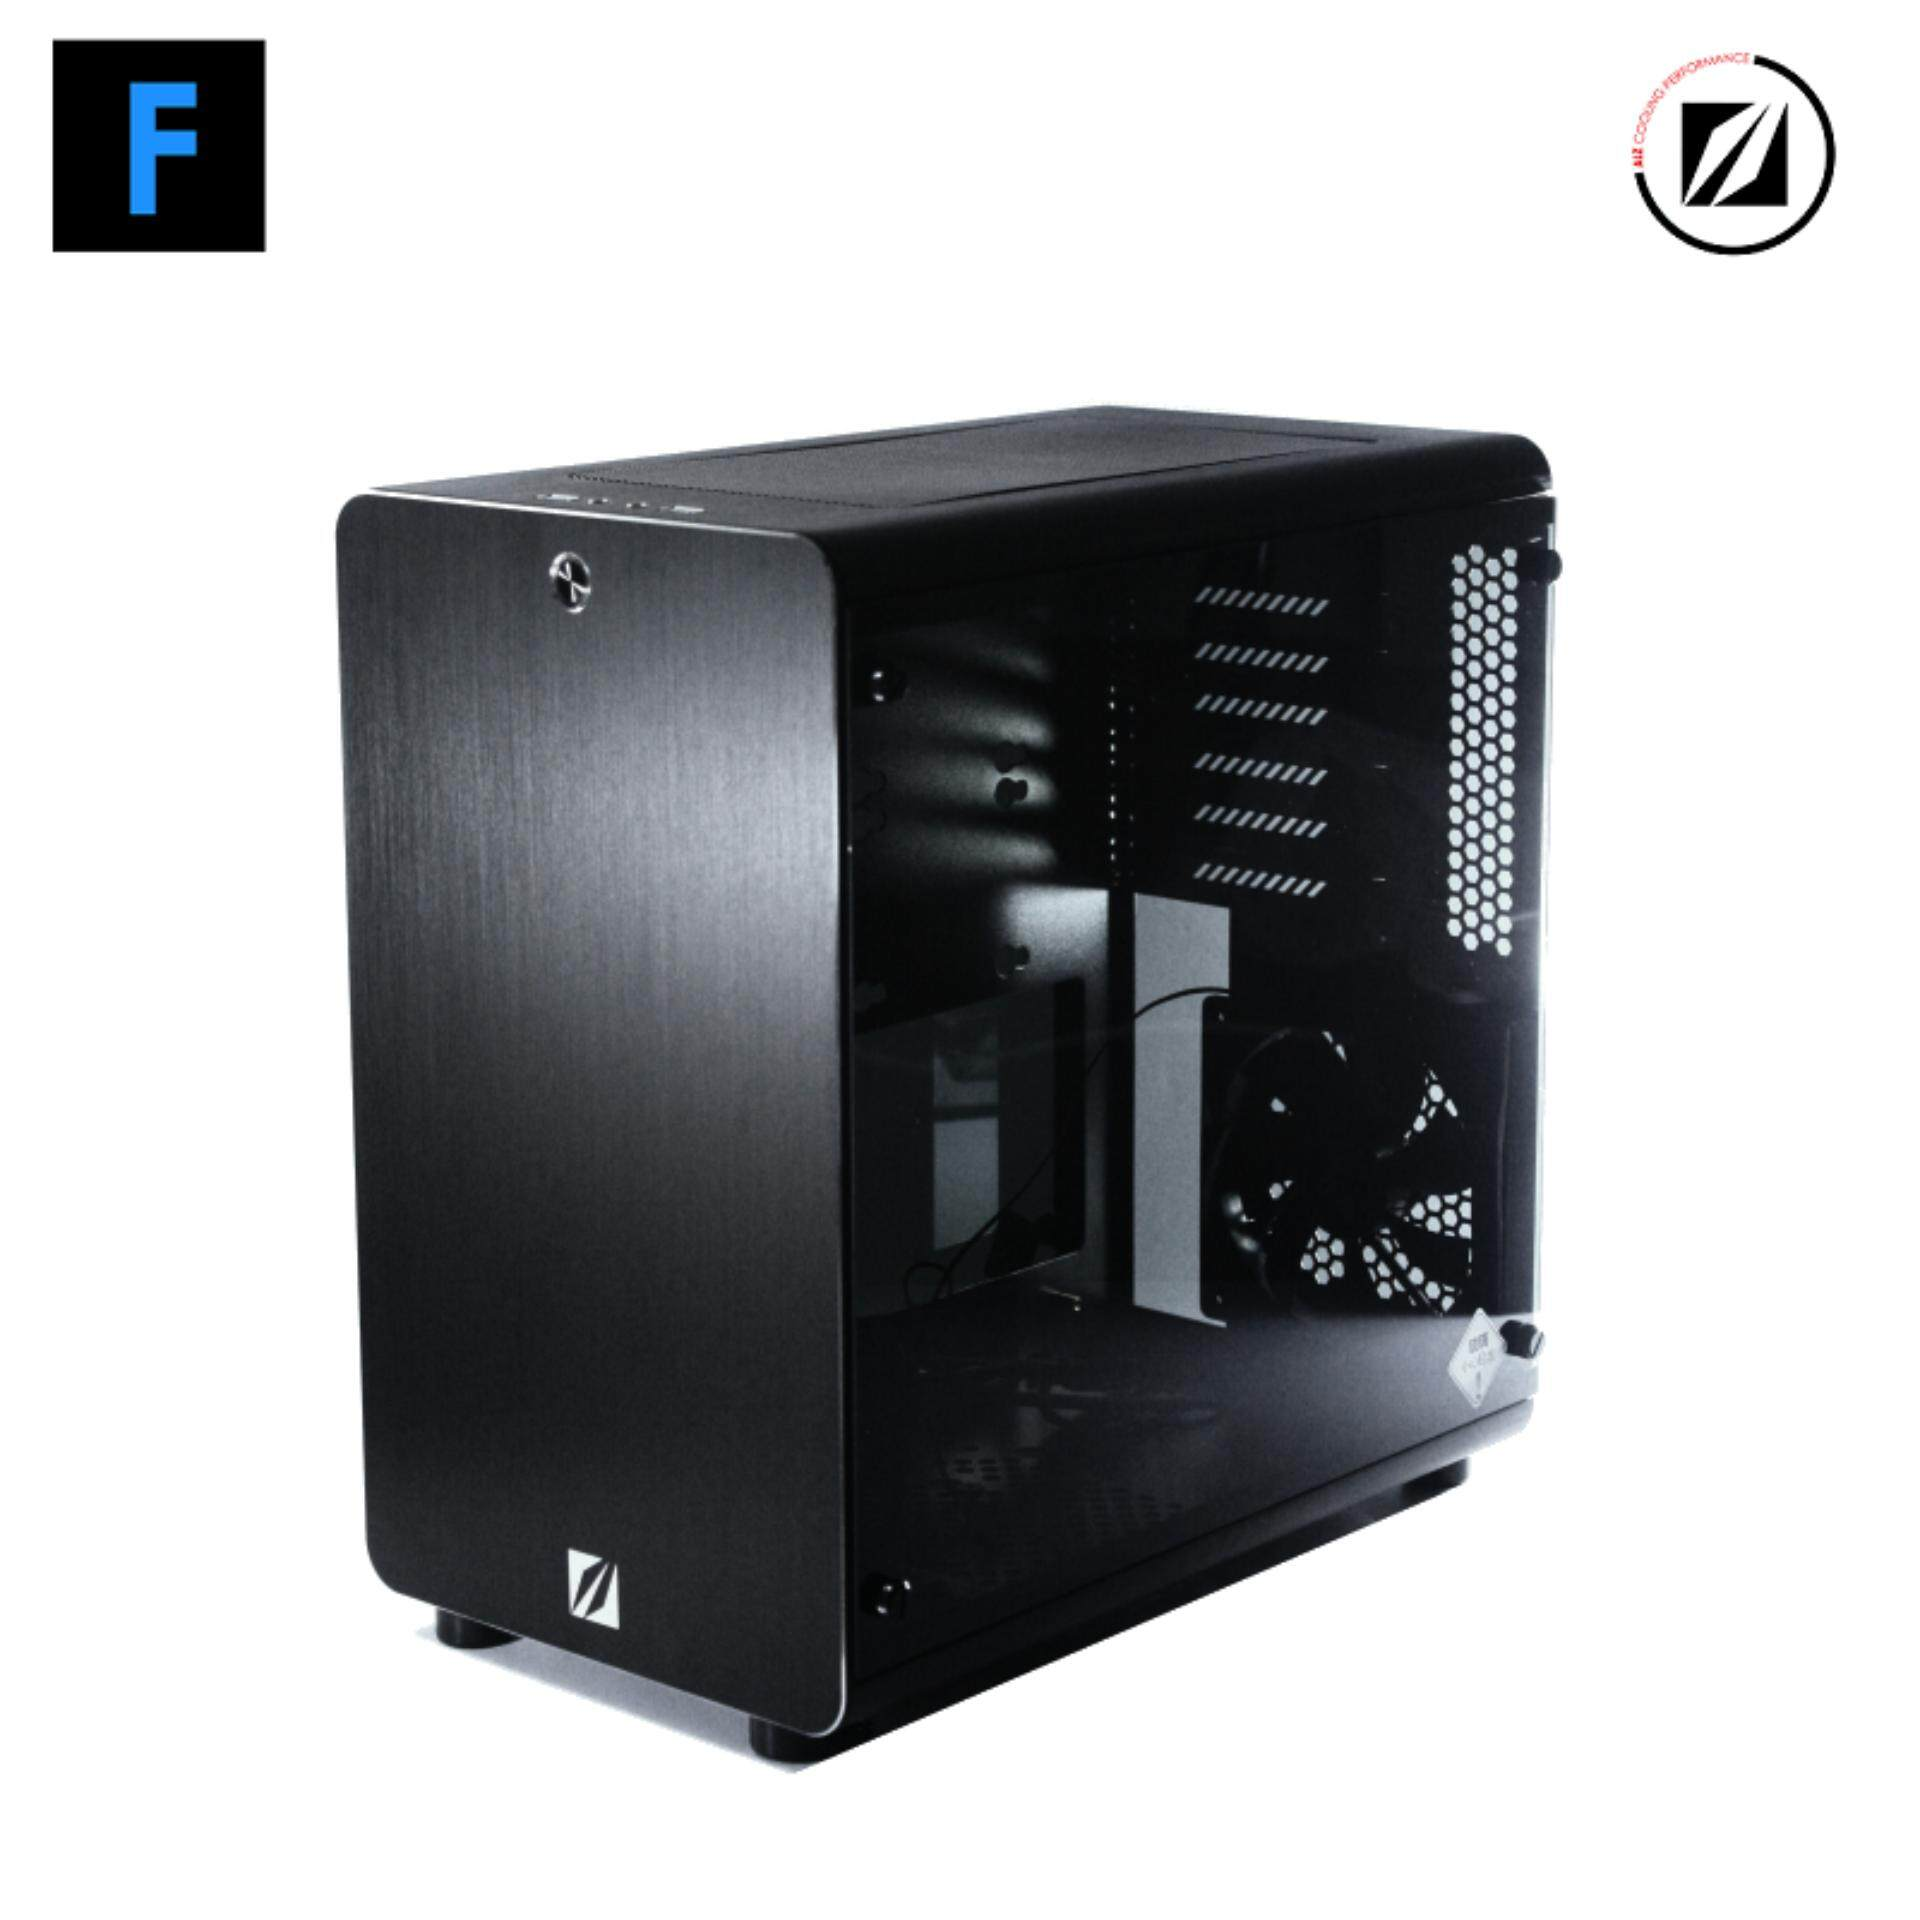 Alz X5 เคสคอมพิวเตอร์อลูมิเนียม [สีดำ/สีเงิน] (max M/b Size : Atx) By Frostnext.